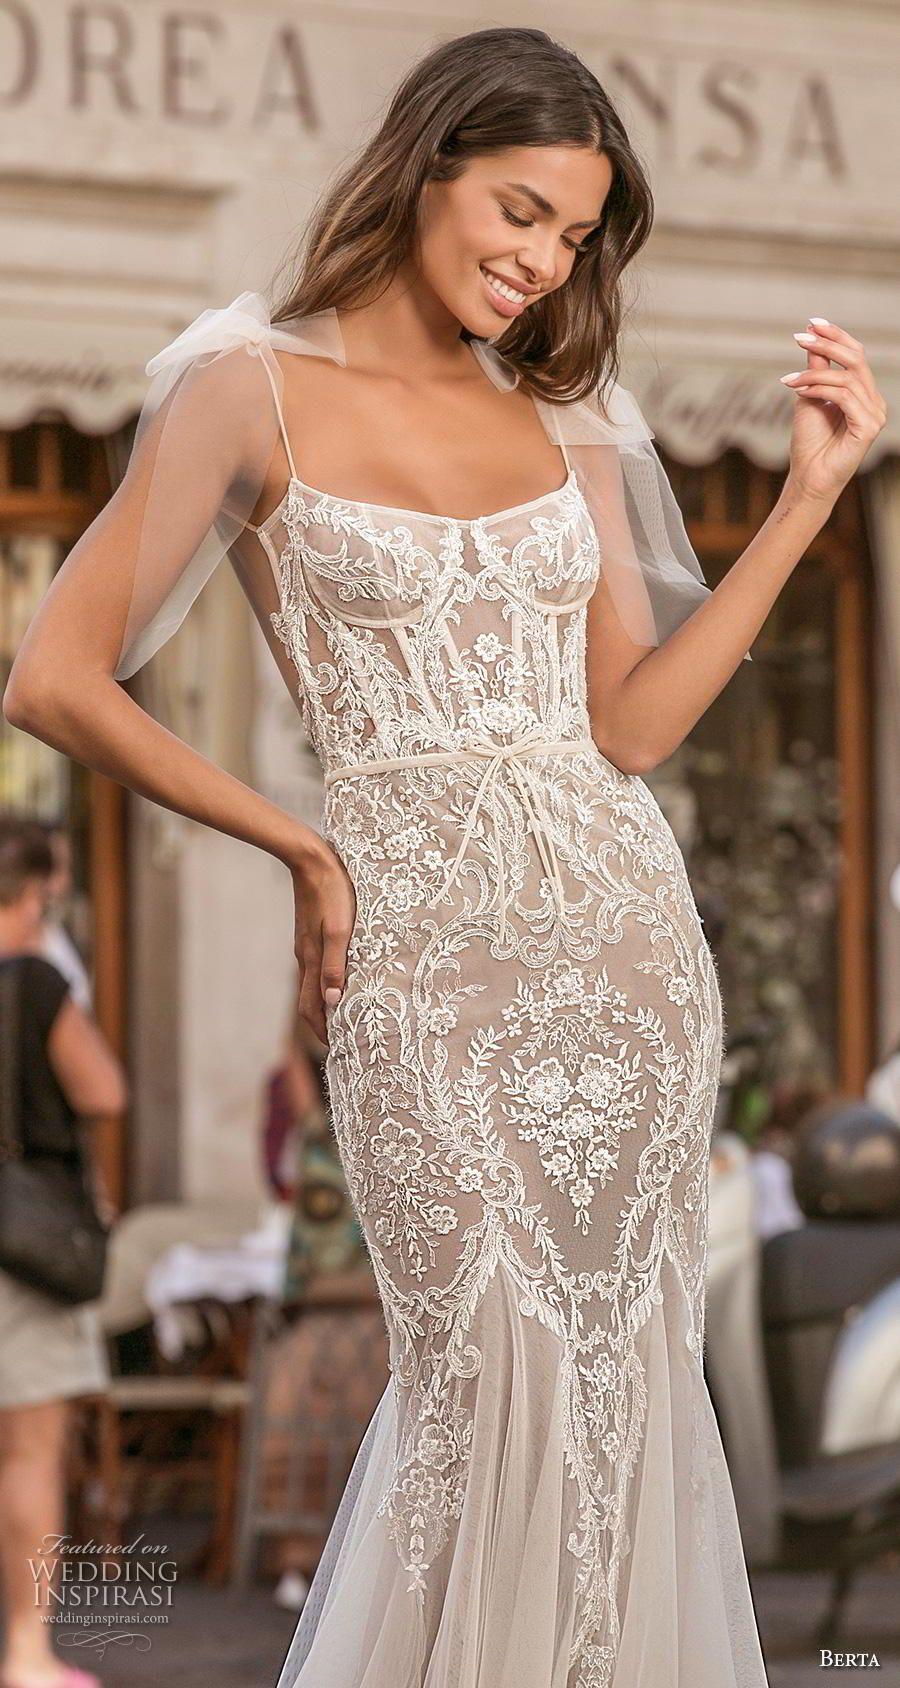 Berta Privee 2020 Wedding Dresses Amalfi Bridal Collection No 3 Wedding Inspirasi Wedding Dresses Modern Wedding Dress Berta Wedding Dress [ 1688 x 900 Pixel ]